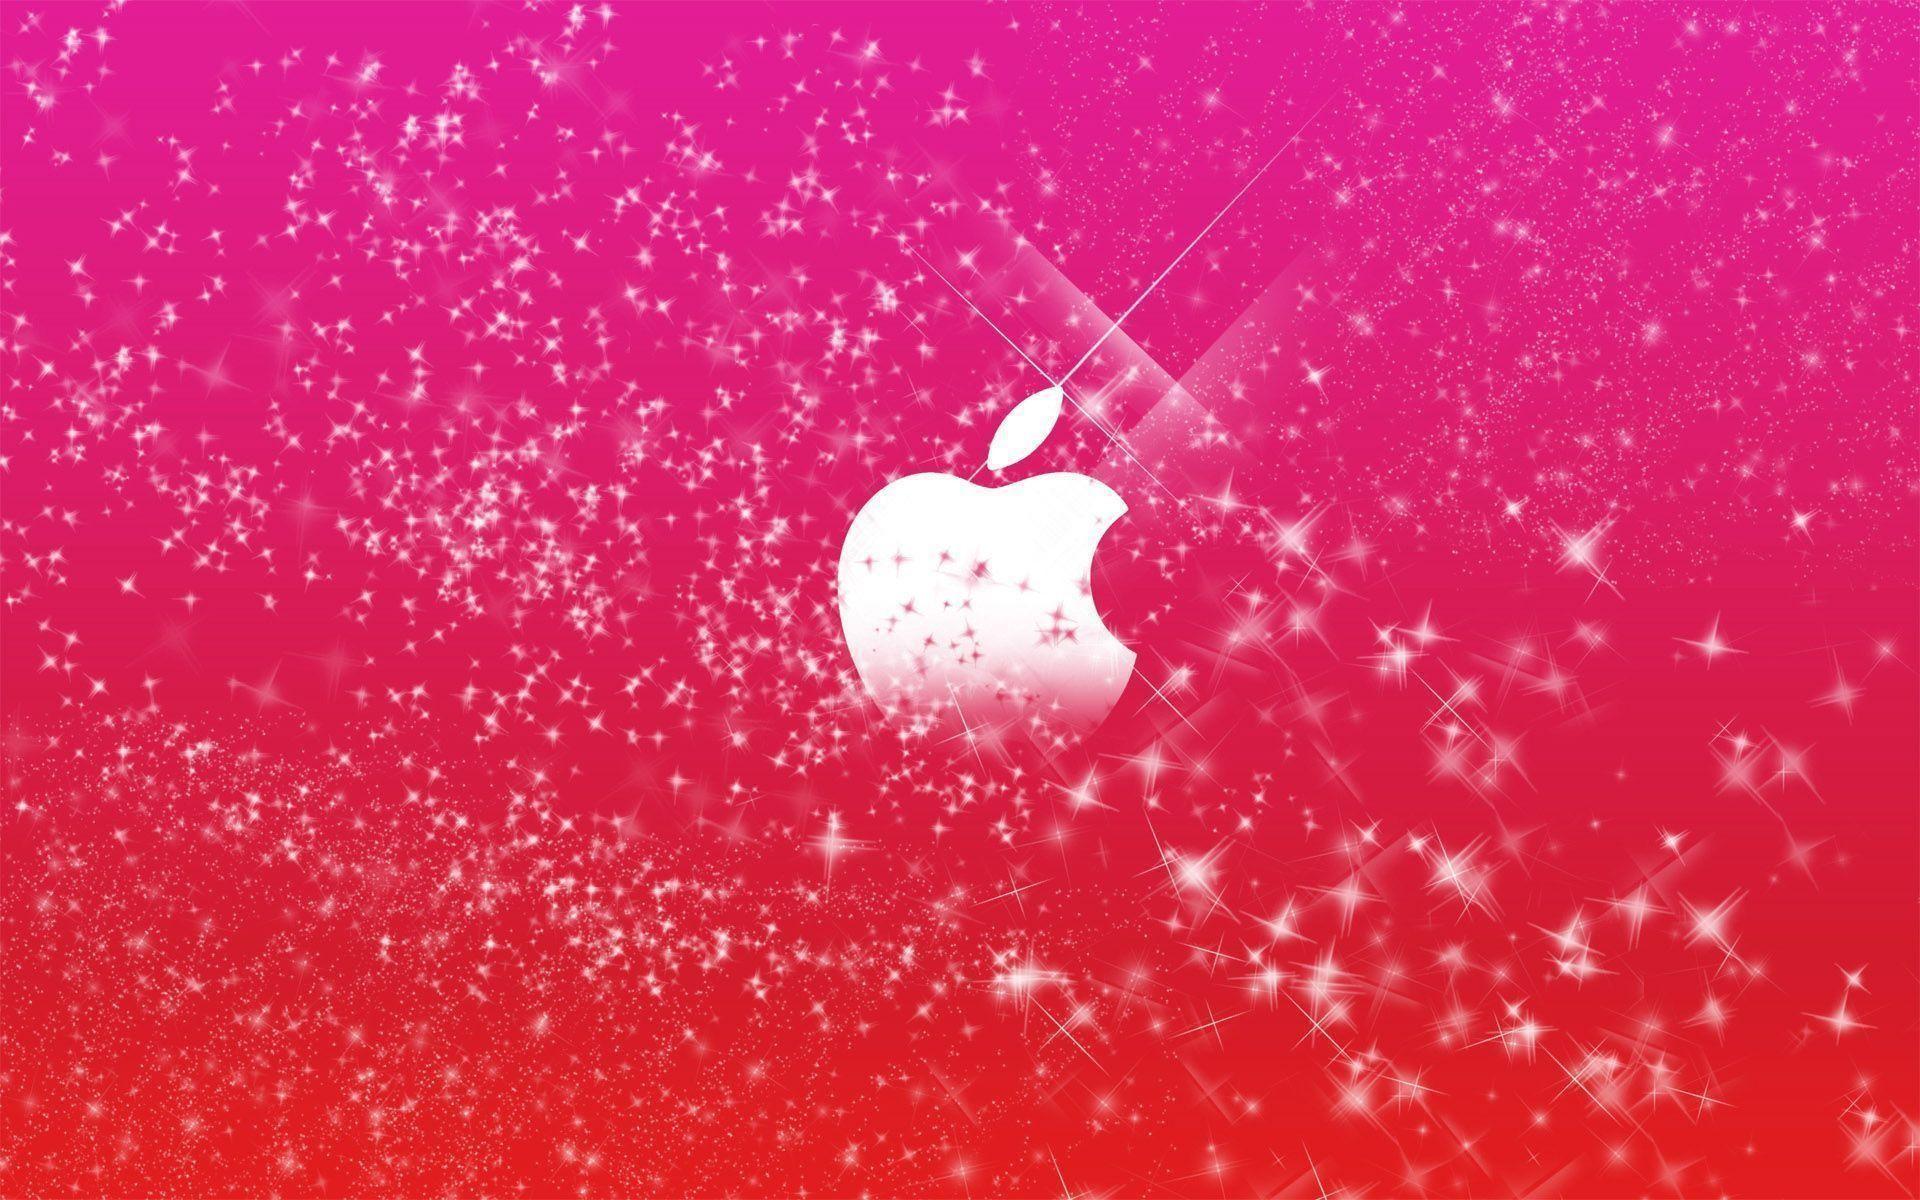 Cute Glitter Wallpaper 62 Images